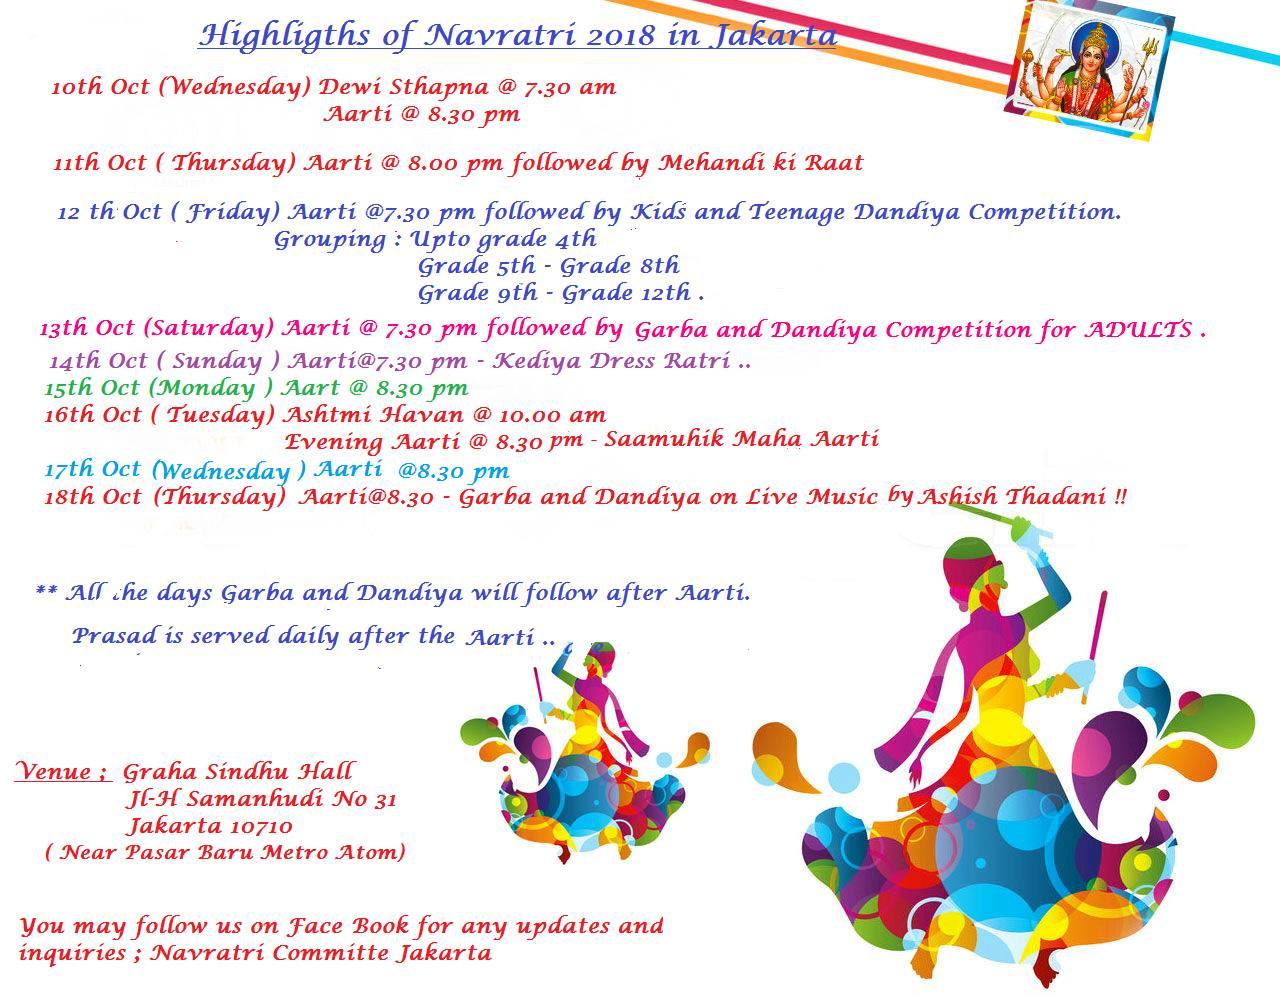 Navratri 2018 highlights